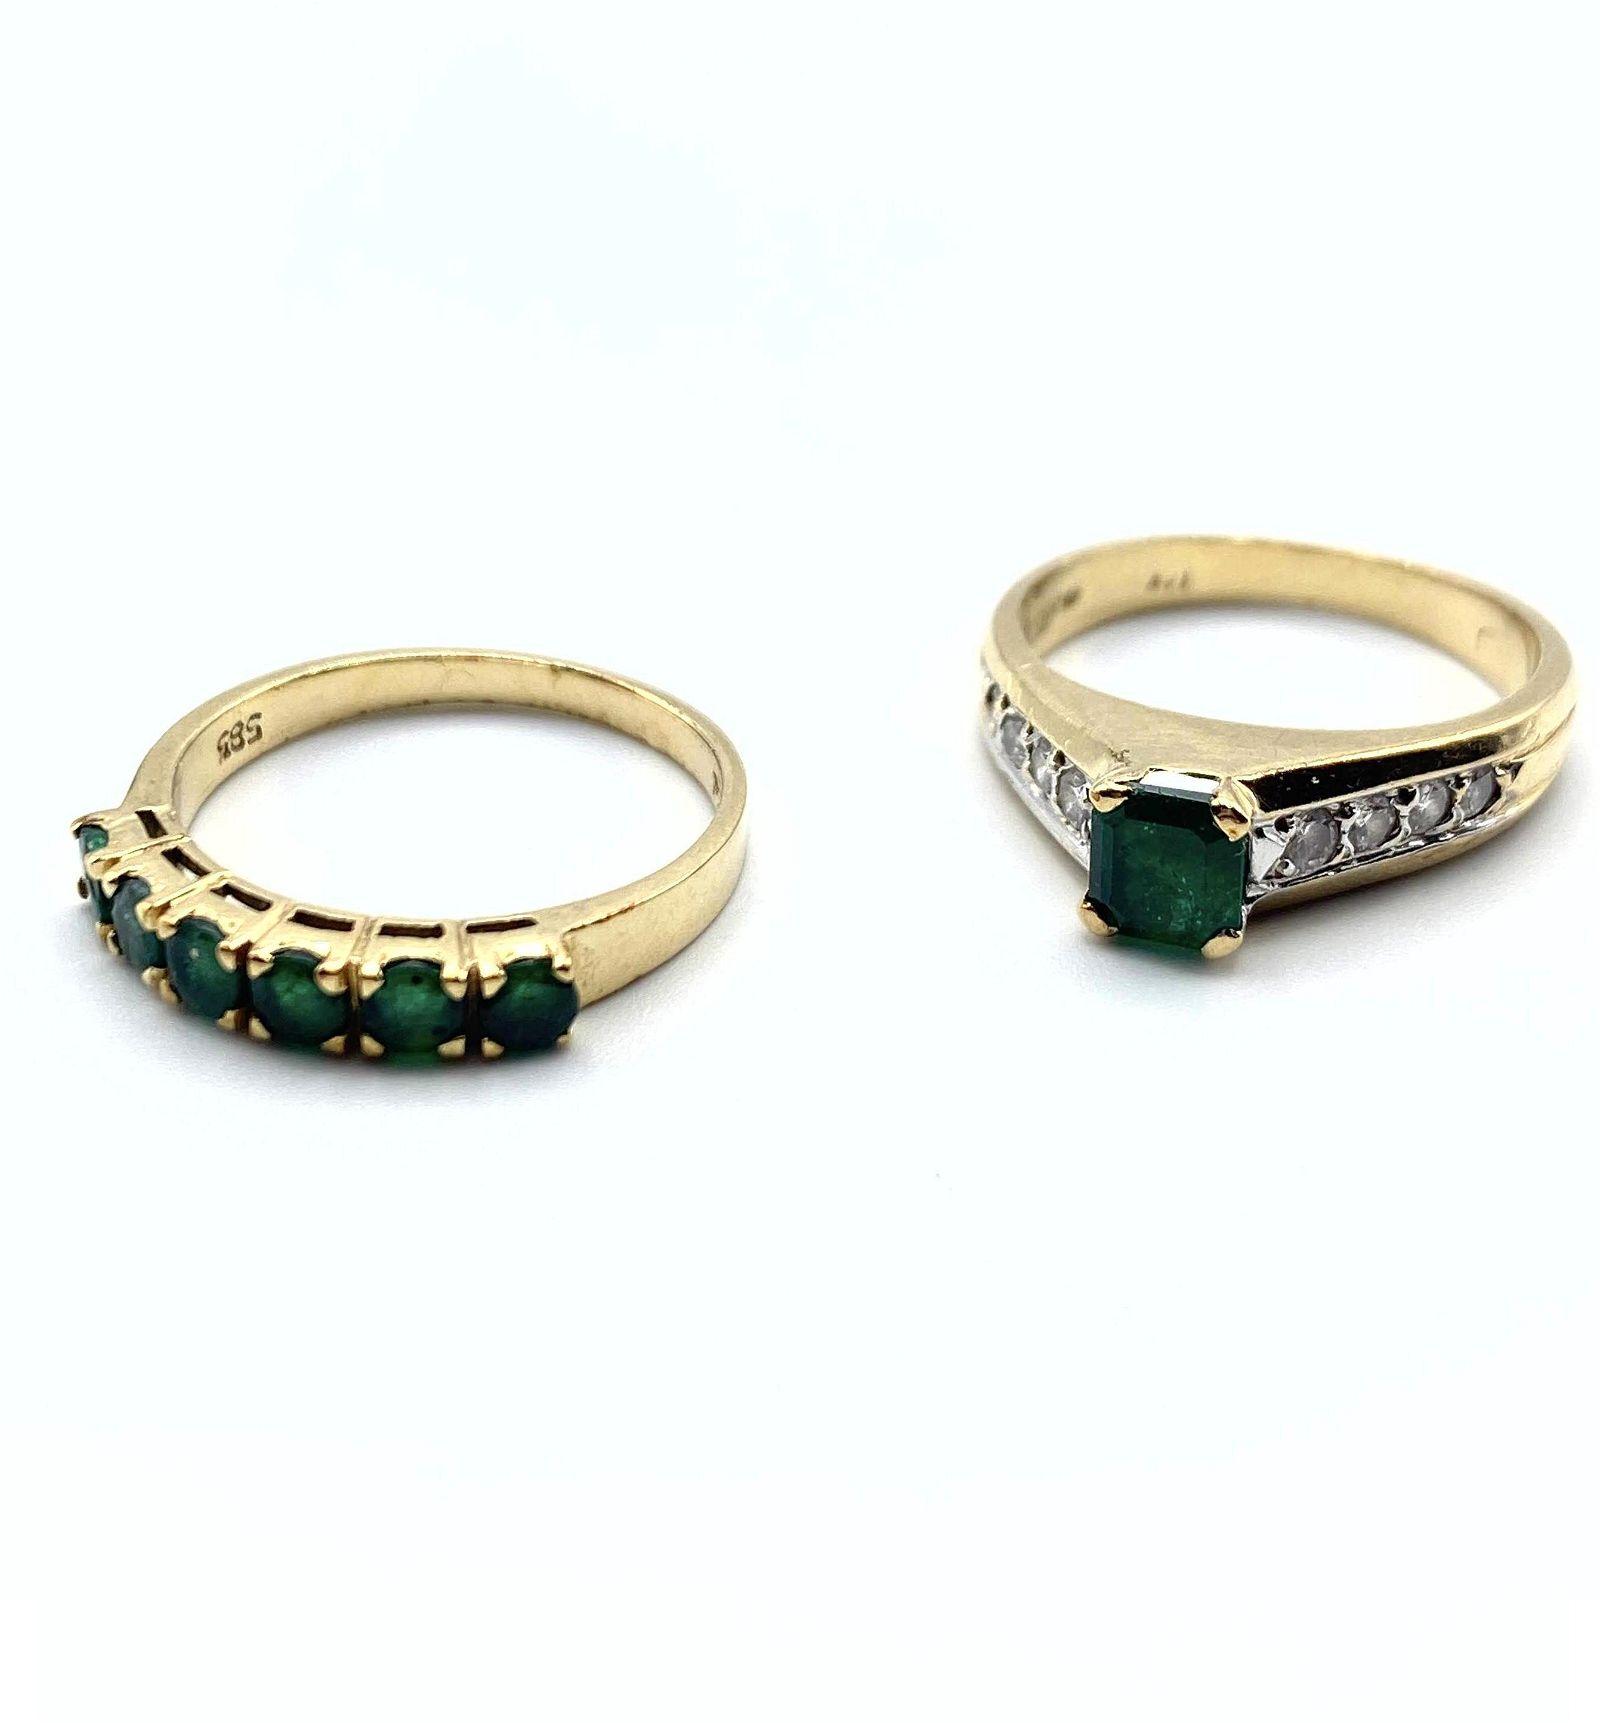 2pc 14K Gold Emerald Ladies Rings. 1) Square emerald st